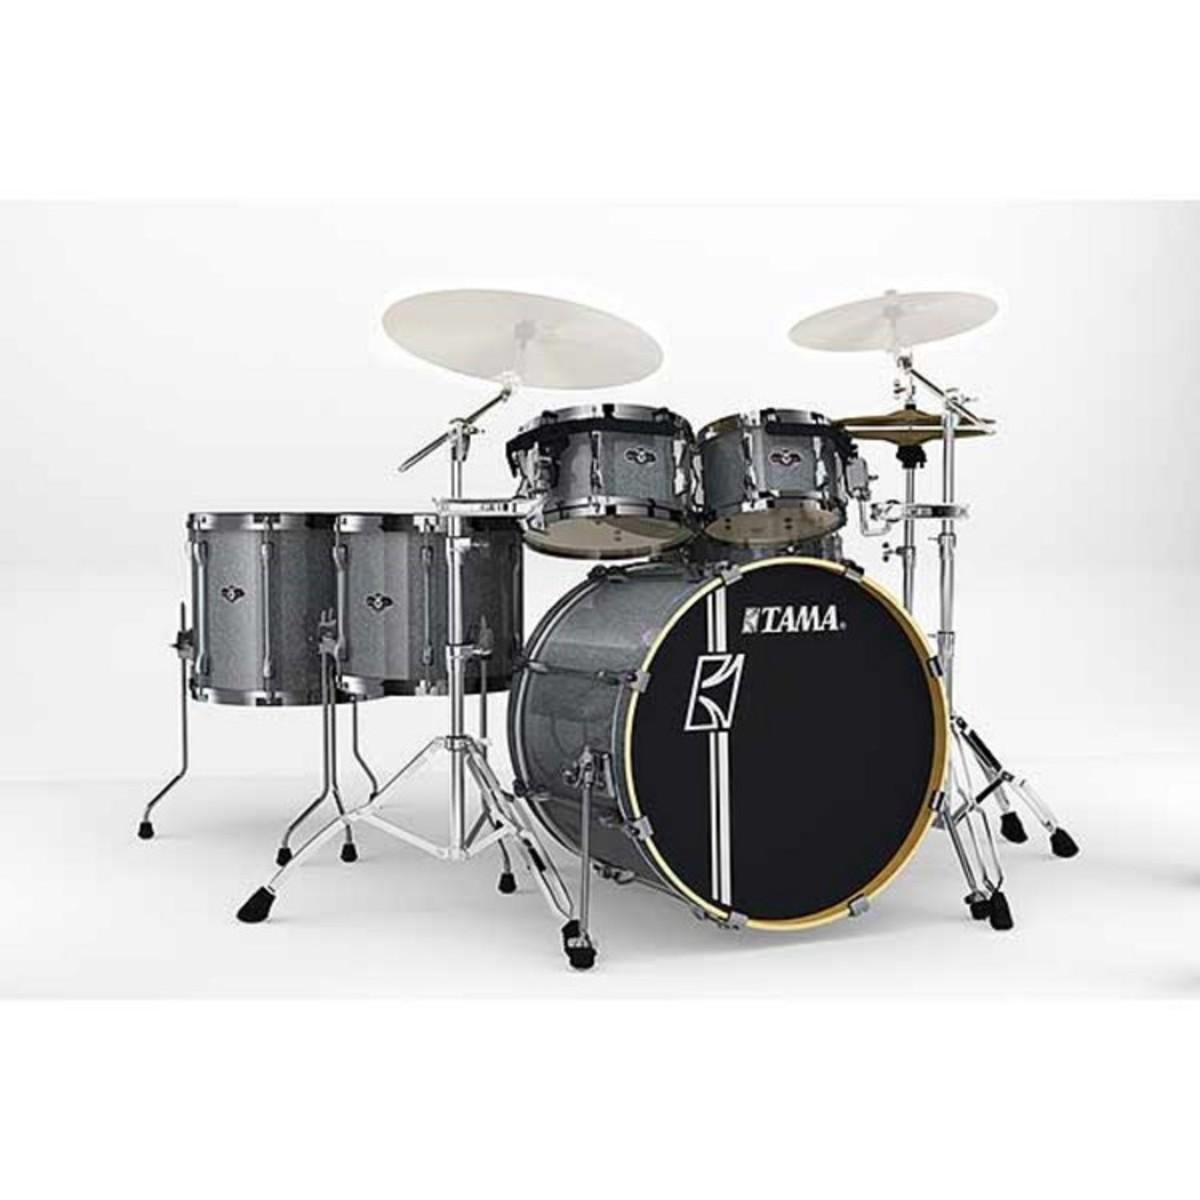 tama superstar hyperdrive drum kit galaxy silver burst at. Black Bedroom Furniture Sets. Home Design Ideas